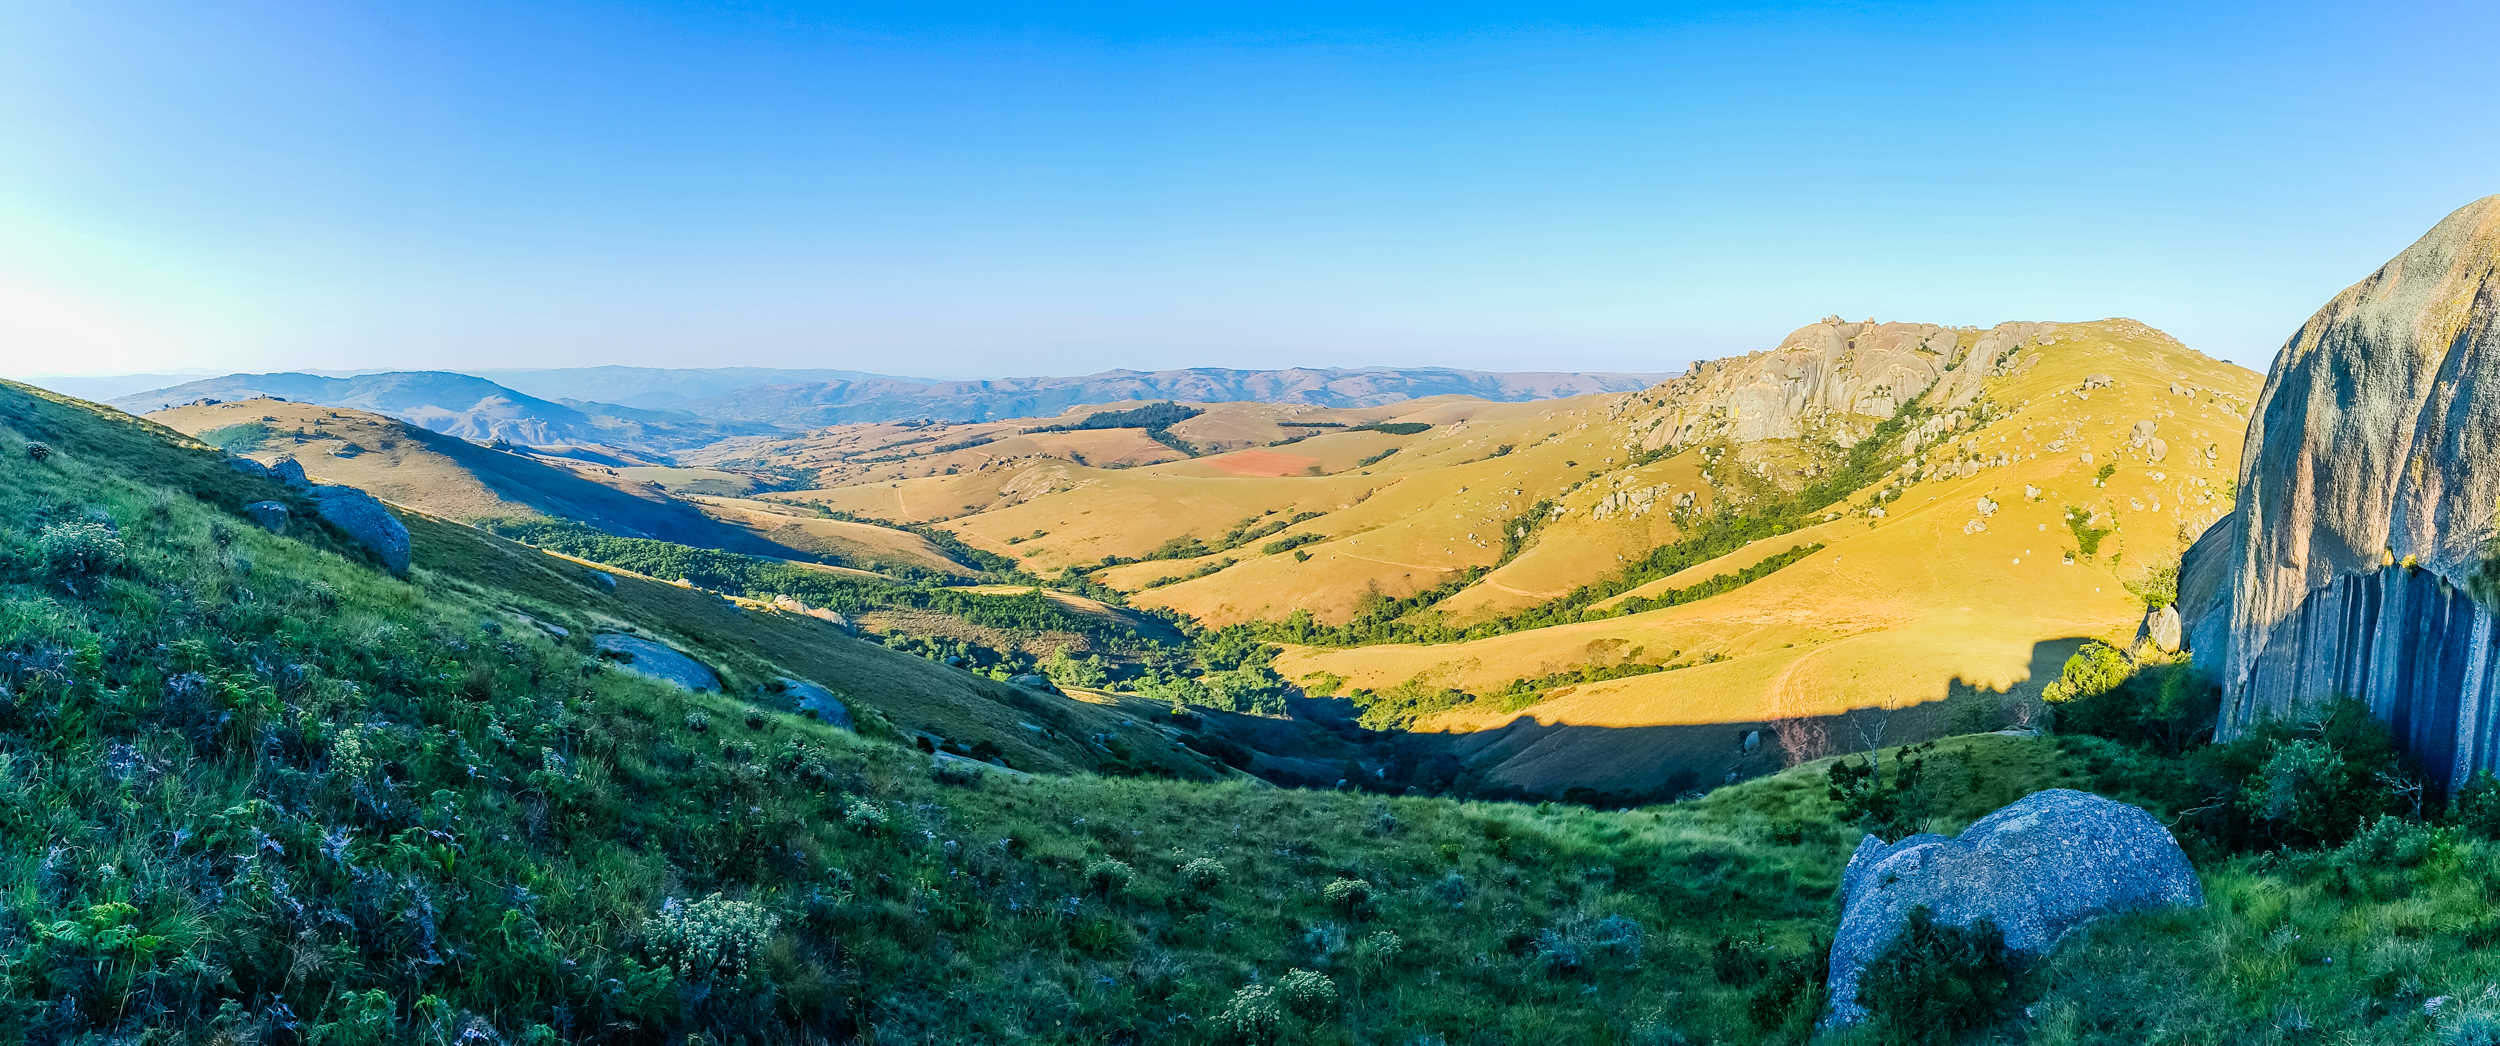 Eswatini, Swaziland, Africa